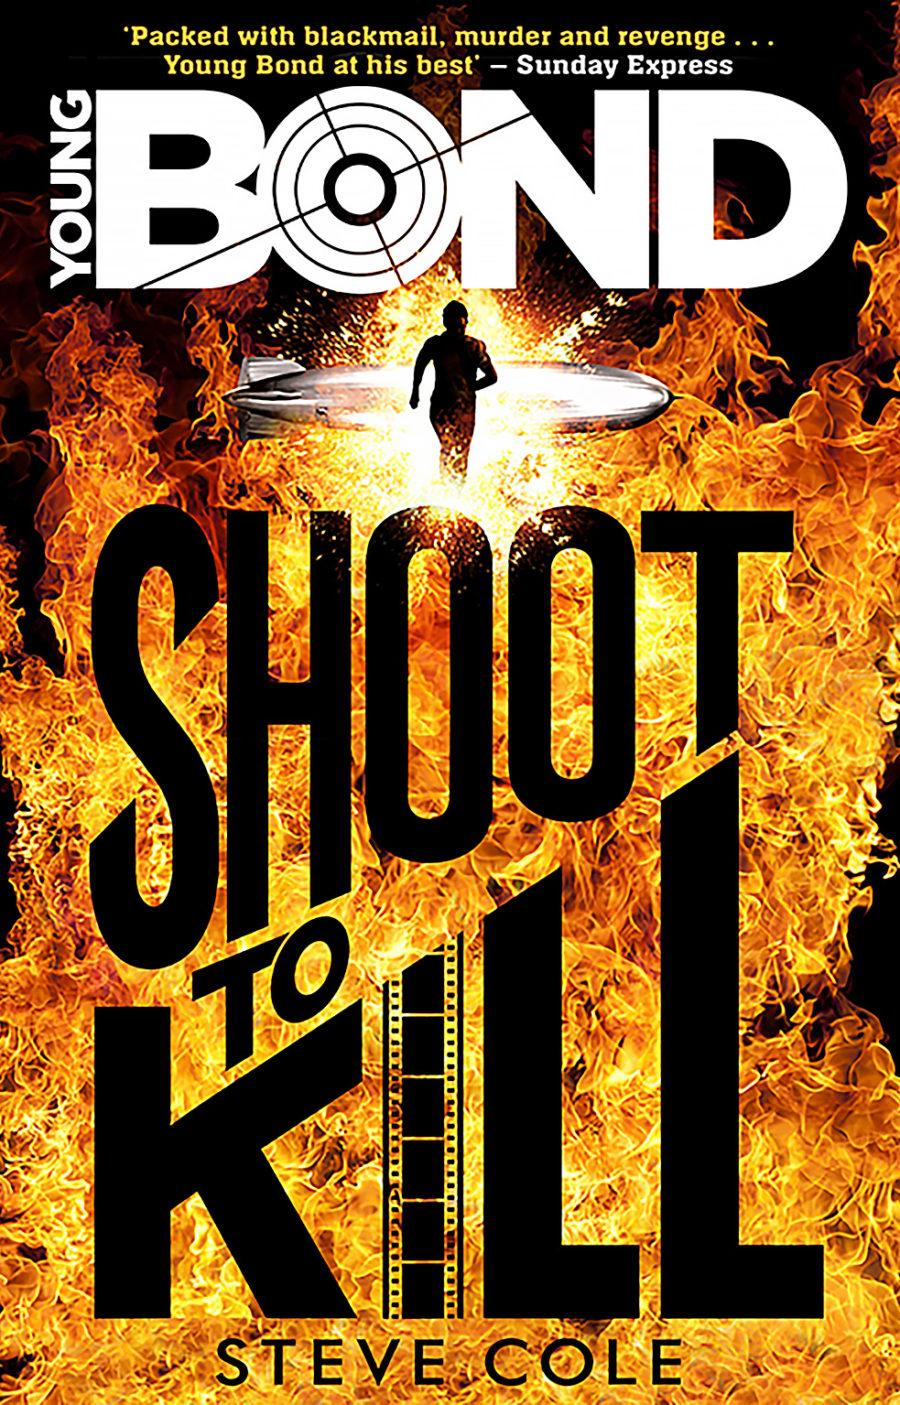 File:Shoot to Kill paperback.jpg